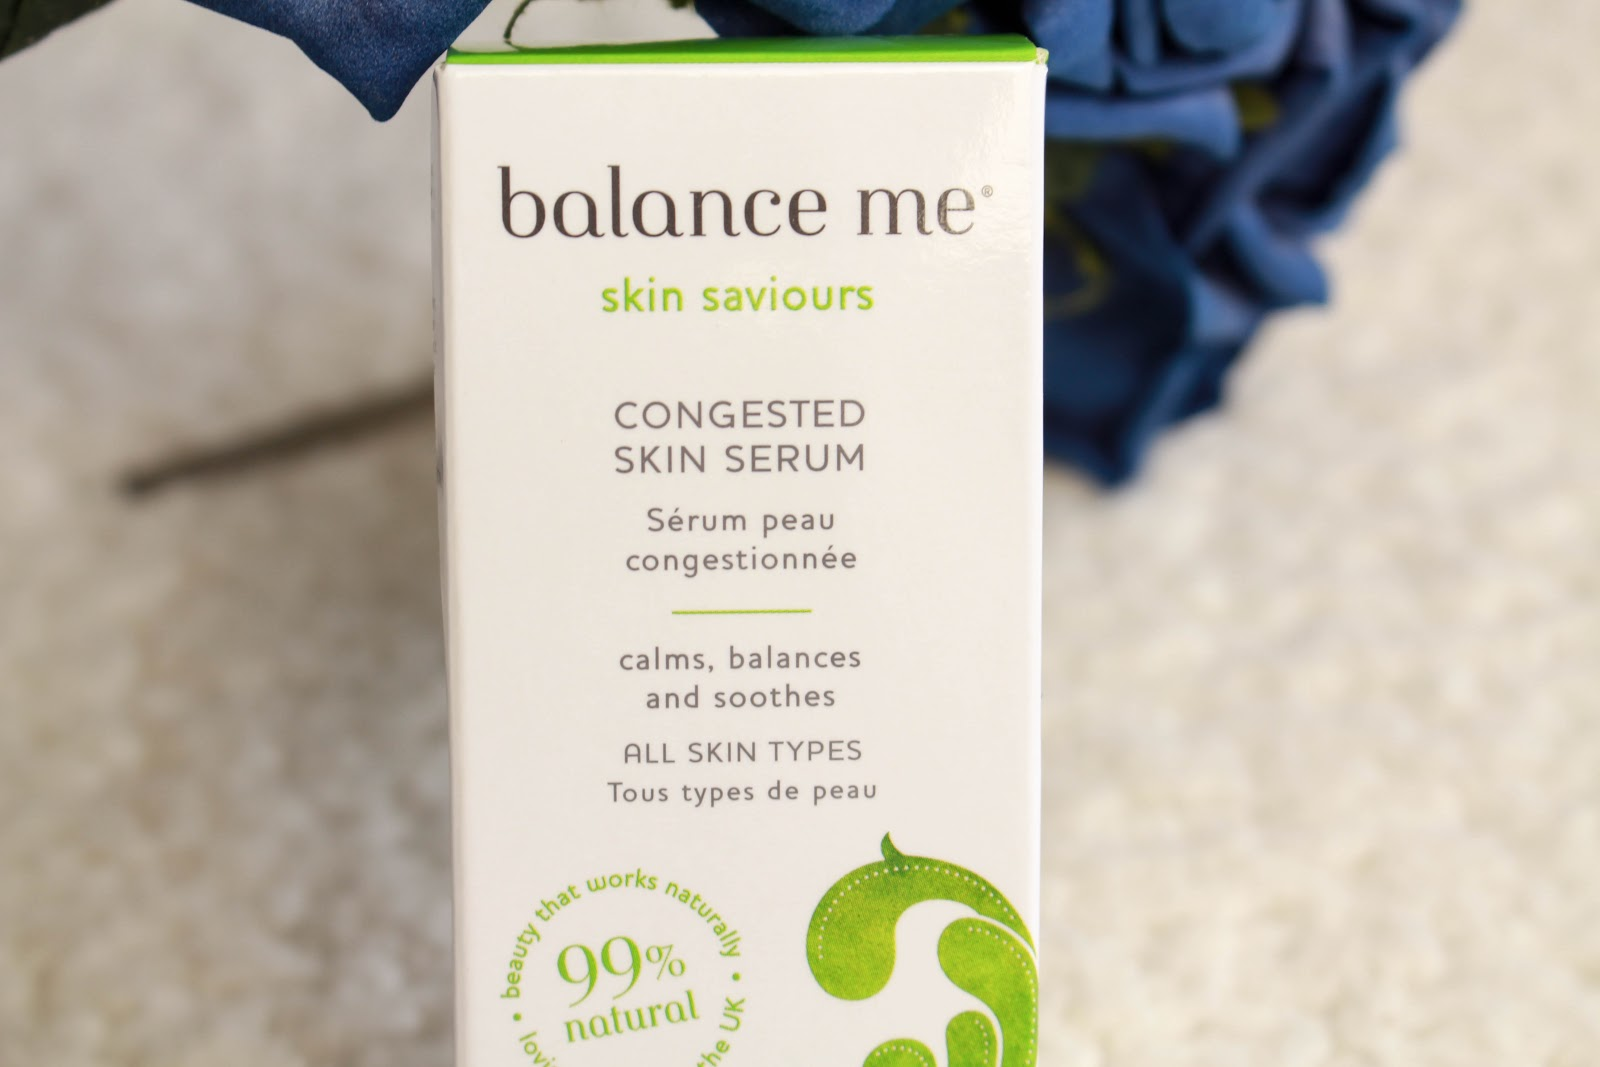 congested skin serum, natural, organic skincare, beauty blogger, balance me,